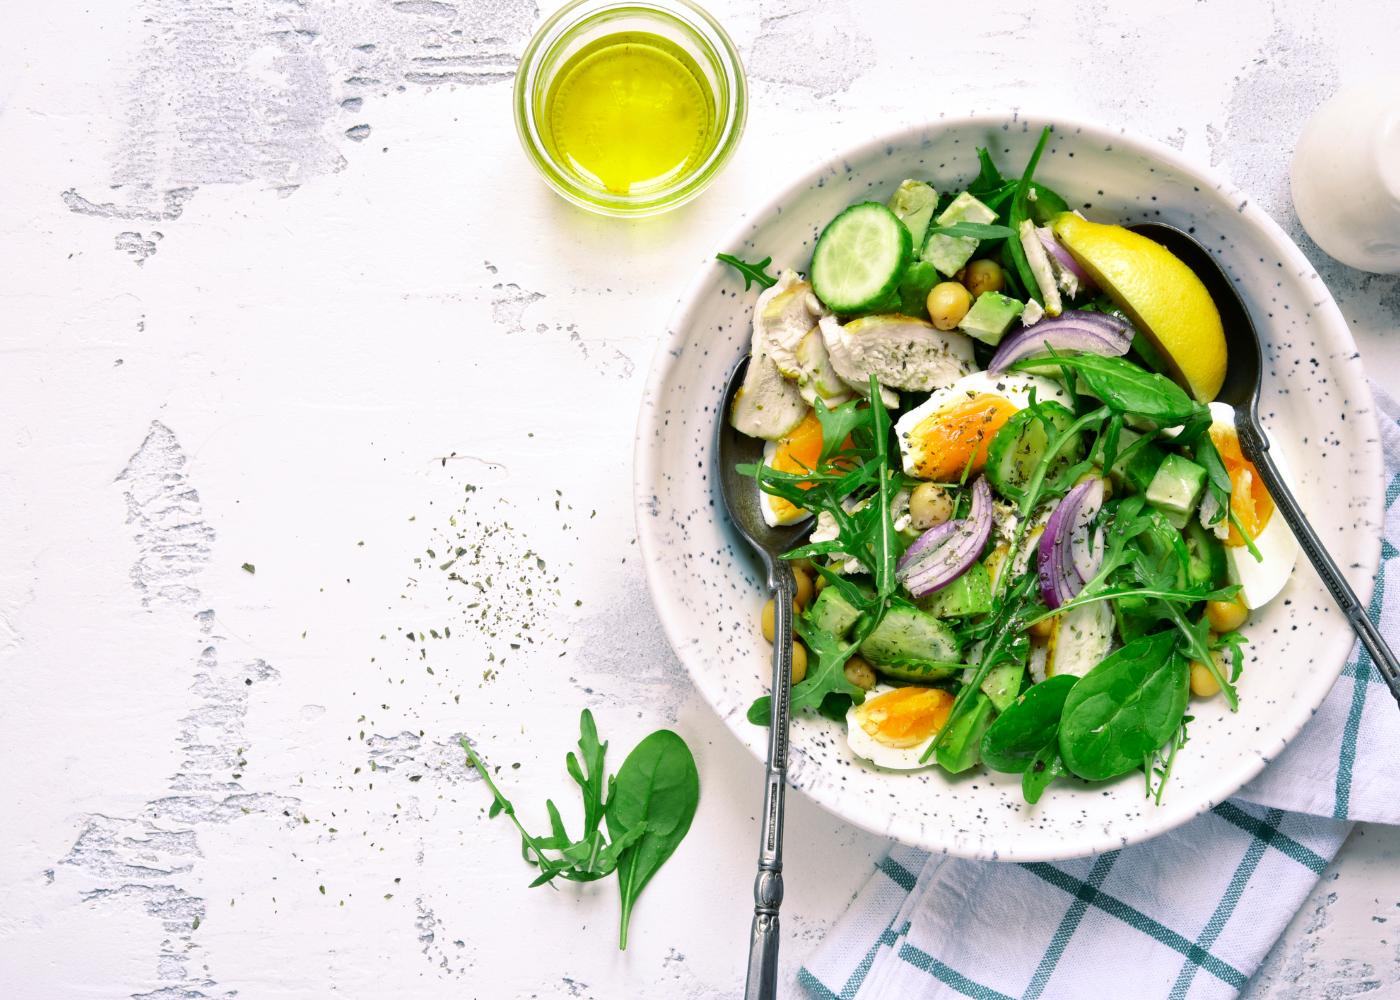 ganho de massa muscular beneficios da alimentacao